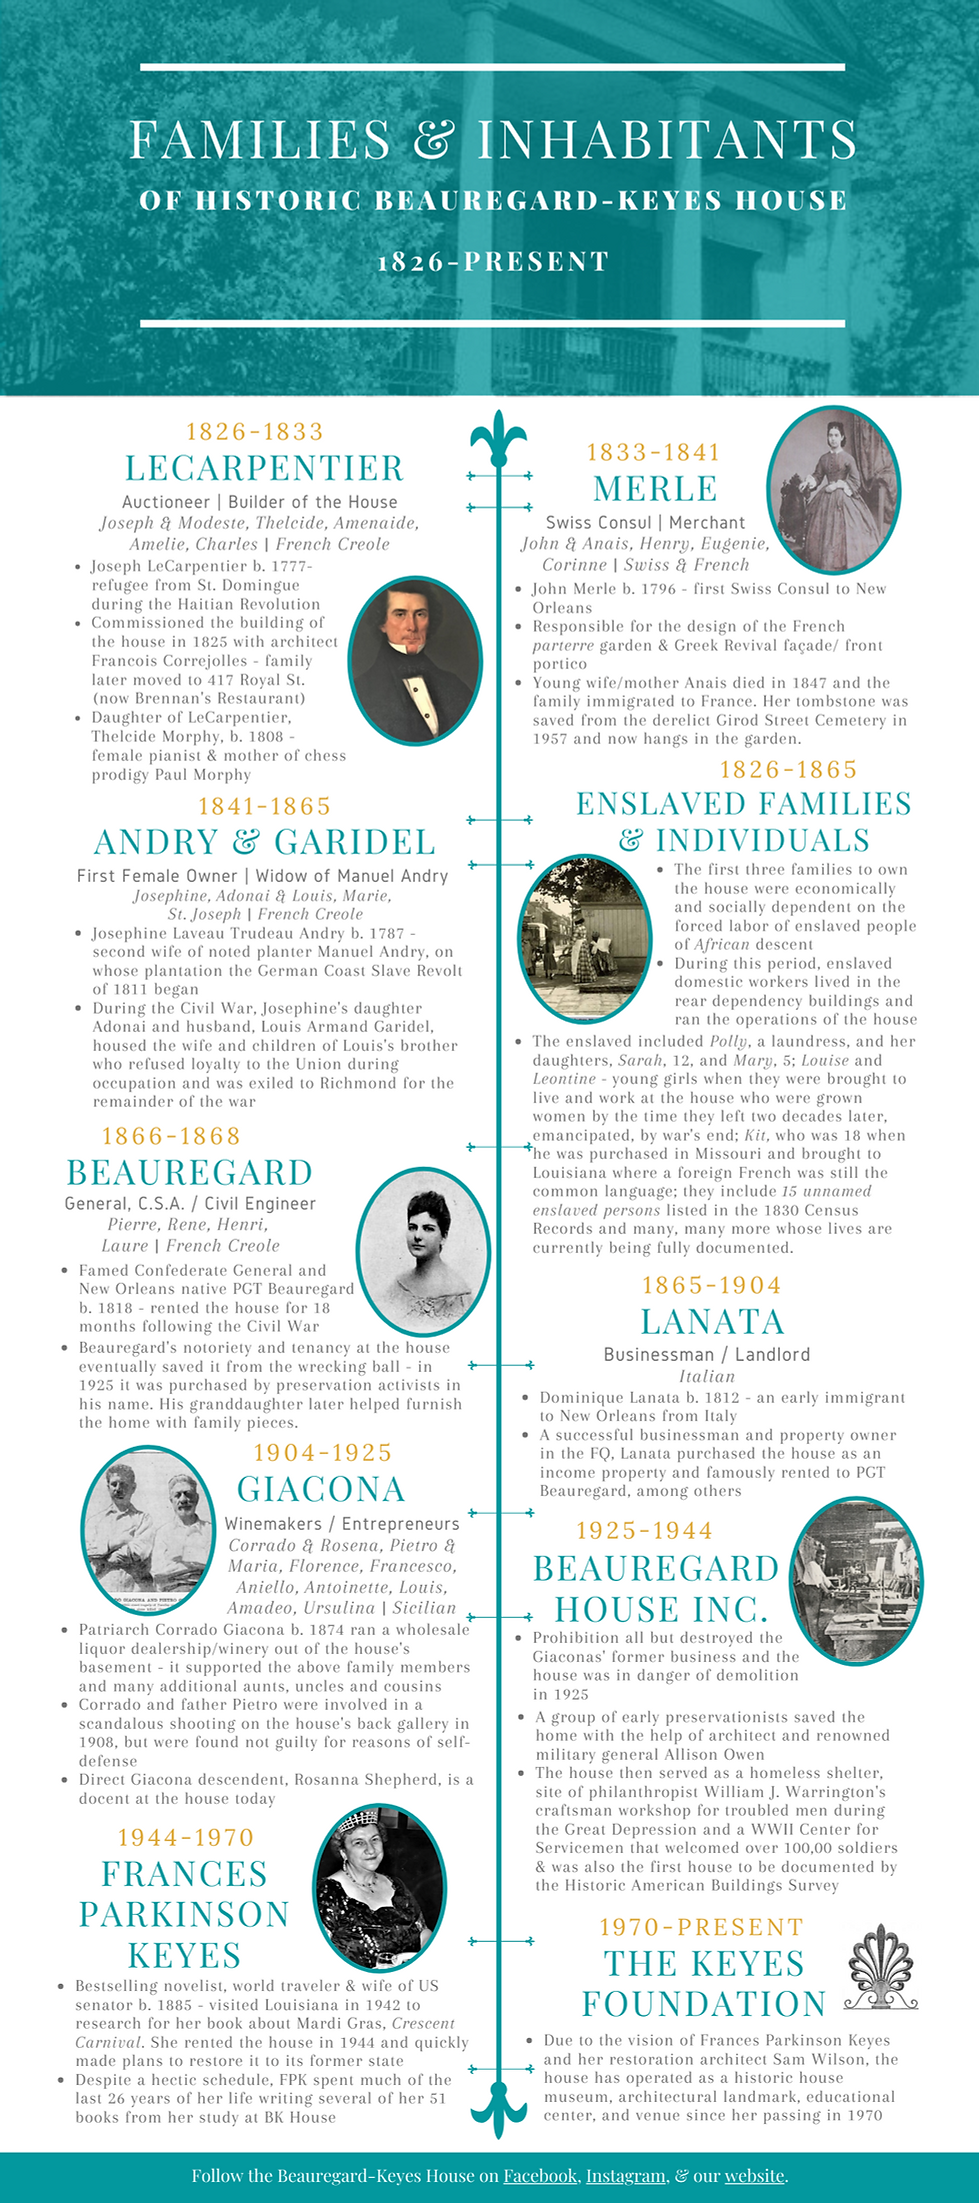 Families of Beauregard-Keyes House Timeline (3).png